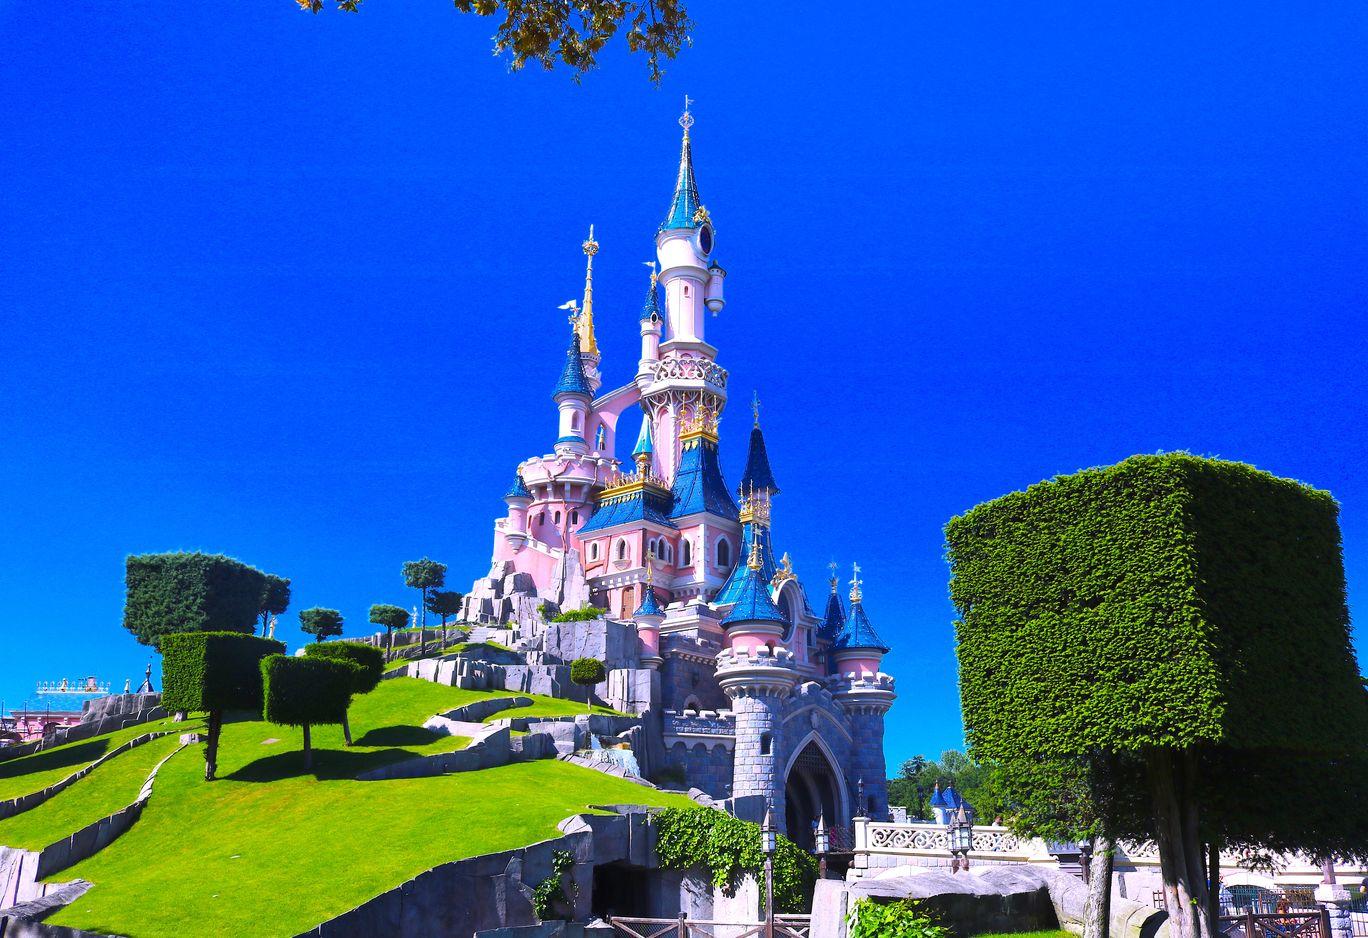 Photo of Disneyland Paris By Shital Khatri